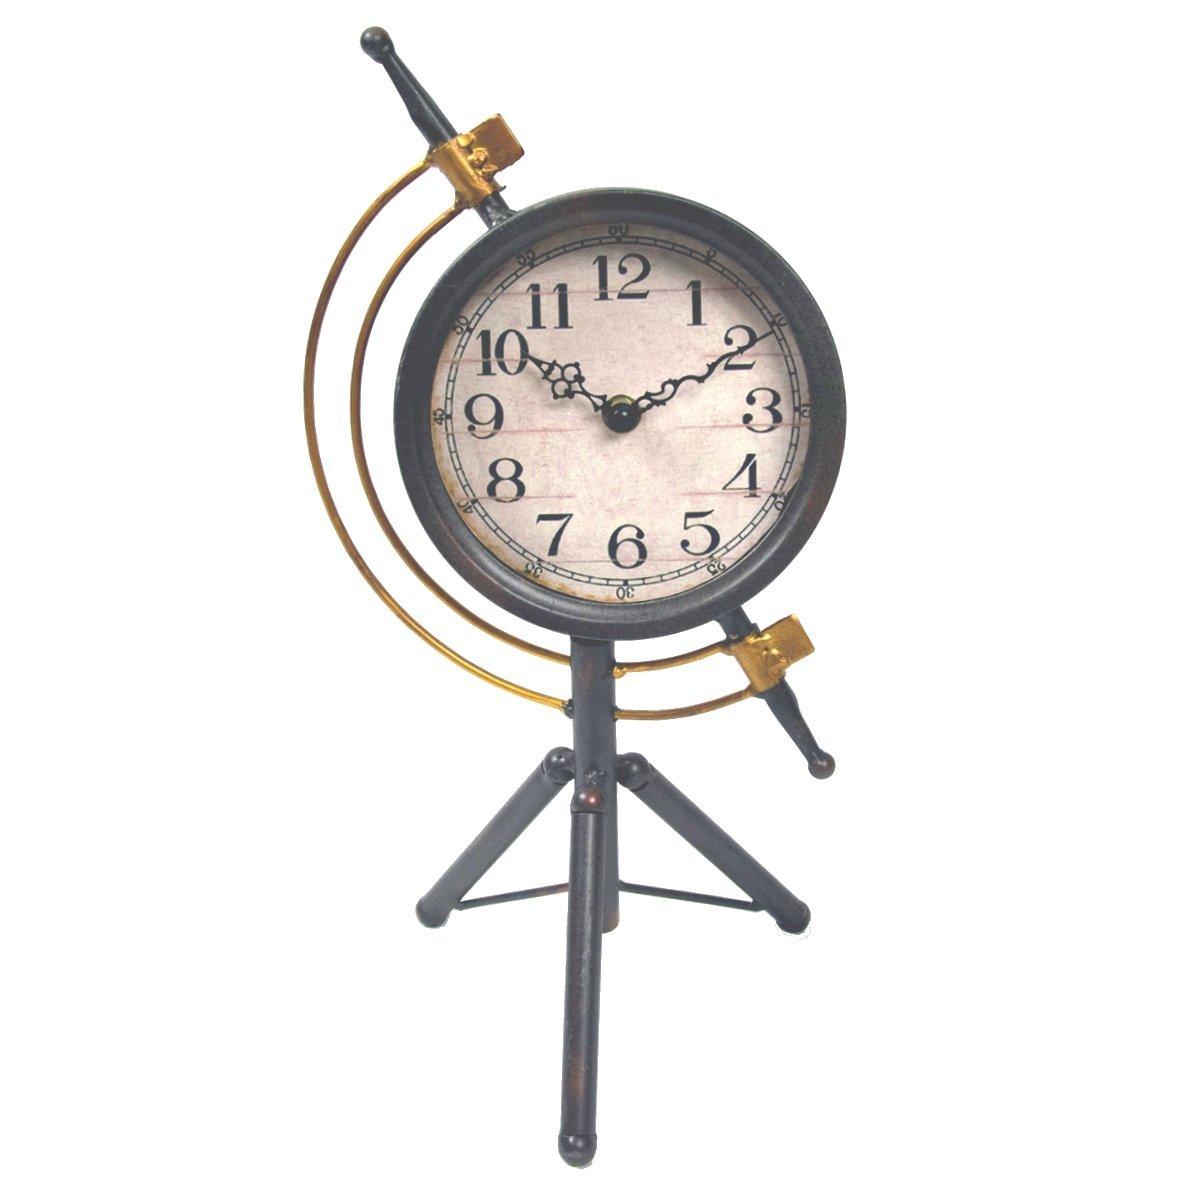 Brown & Ginger Grey/Gold Industrial Armillary Style Mantel Clock - 20cm W x 38cm H x 15cm D